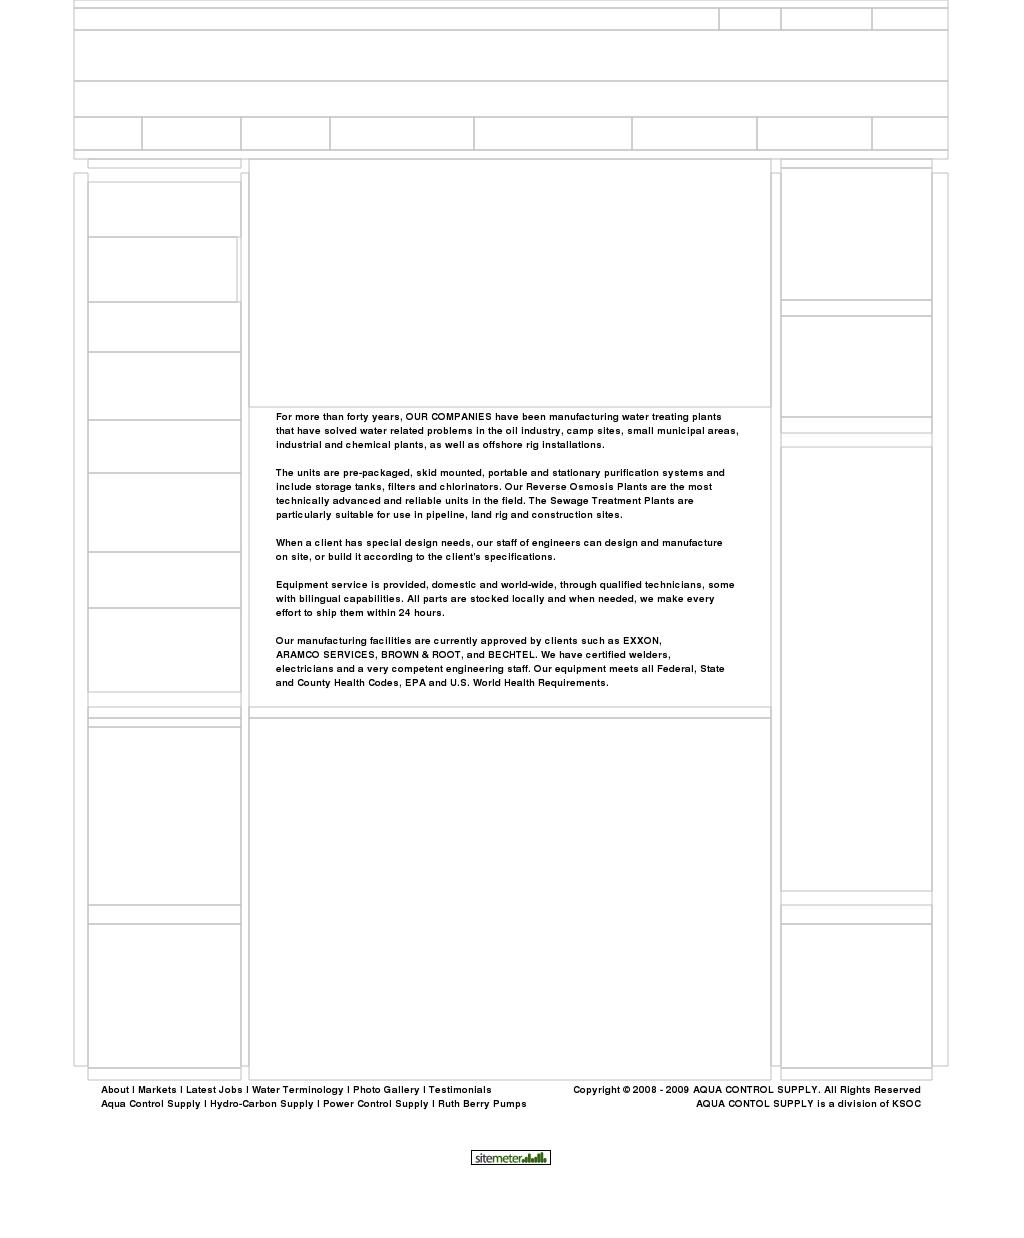 Acscoi Competitors, Revenue and Employees - Owler Company Profile